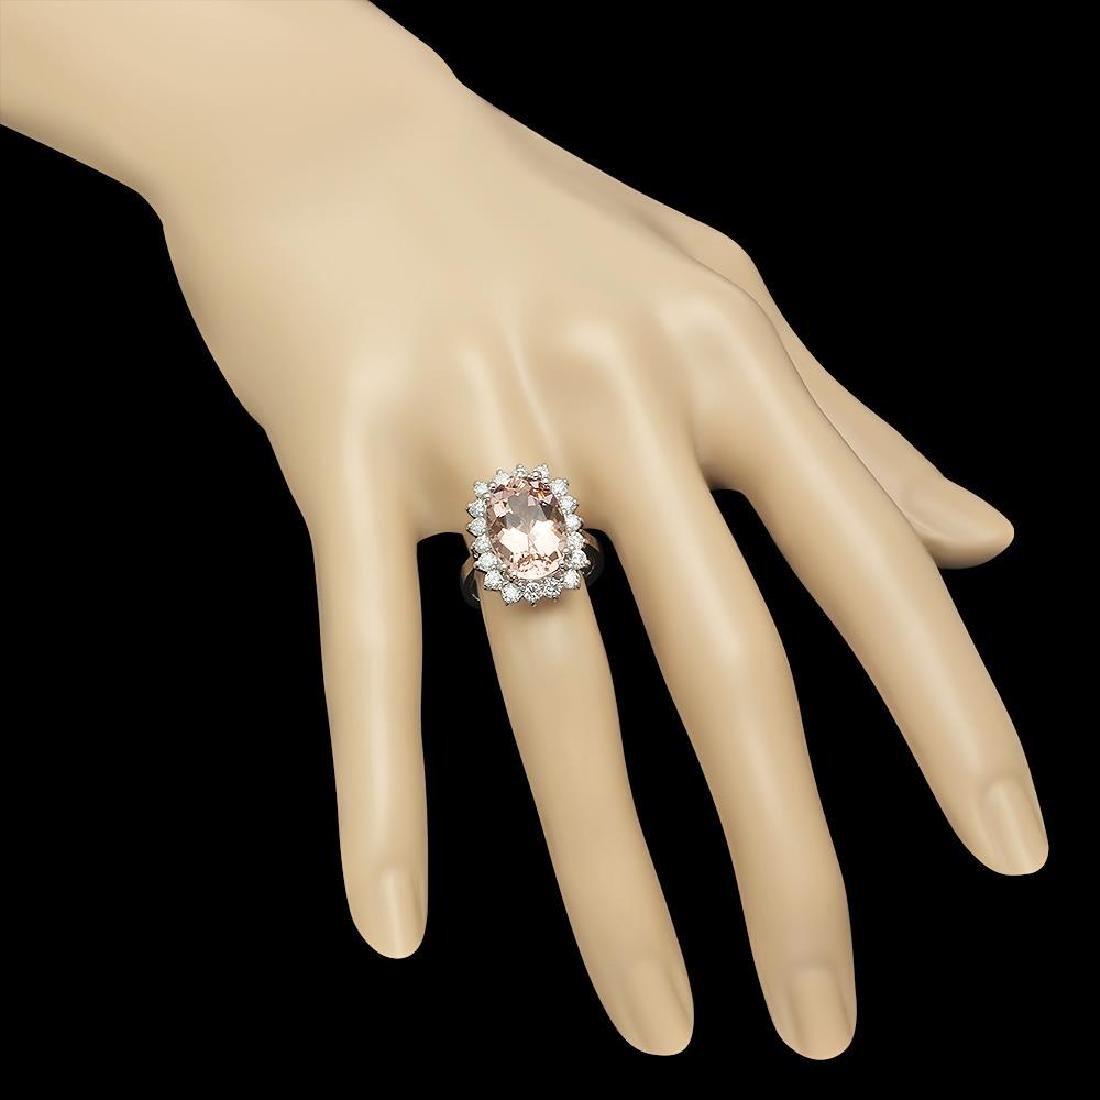 14K Gold 6.23ct Morganite 1.16ct Diamond Ring - 3